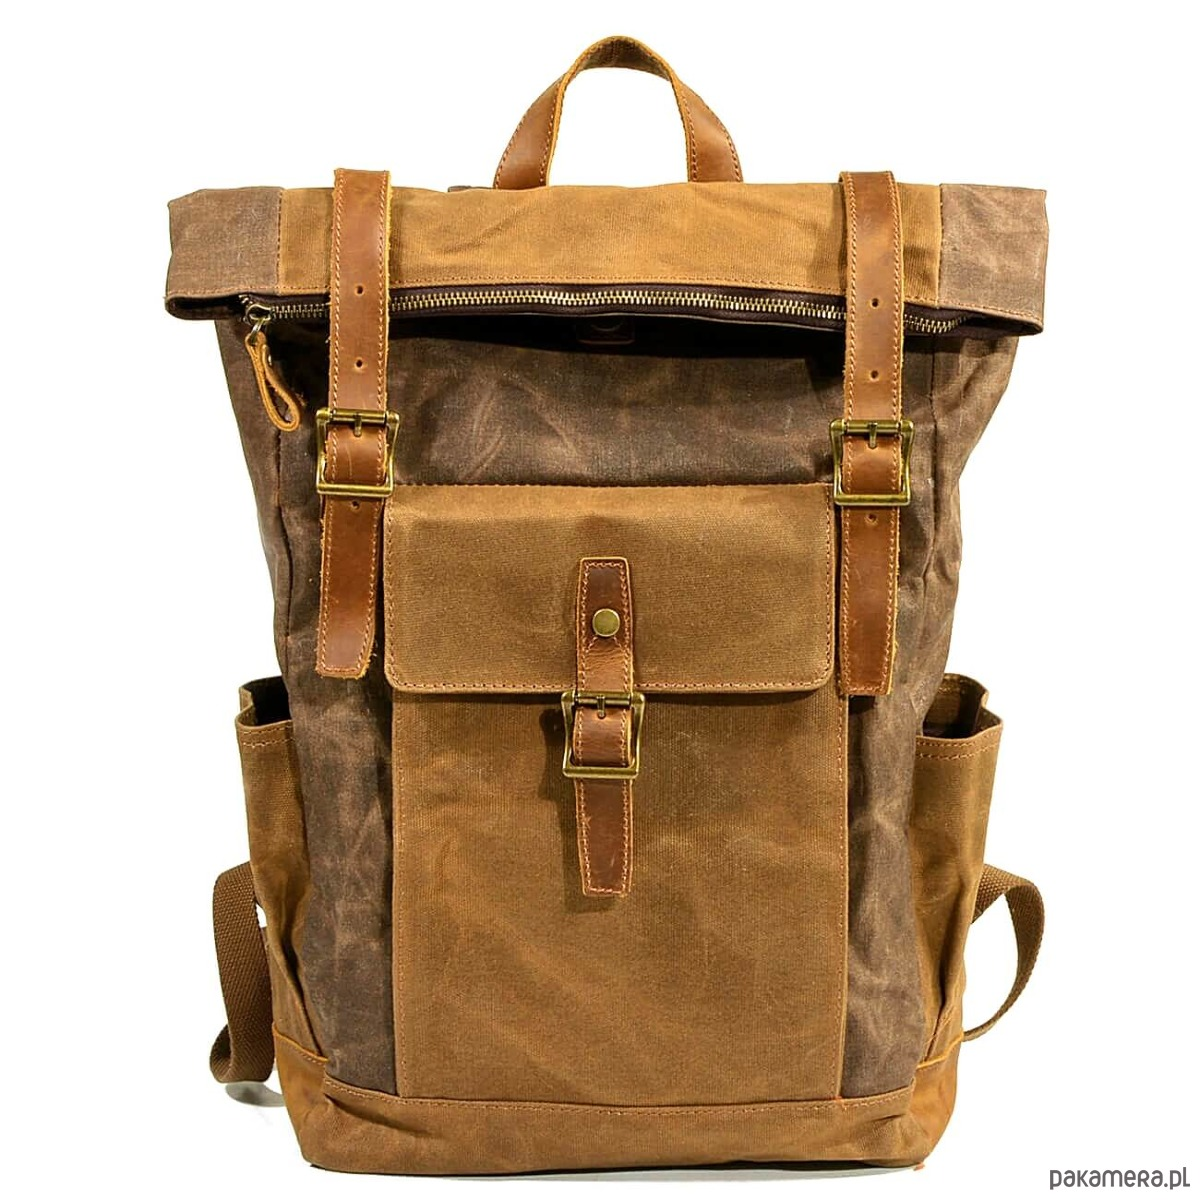 6971ee43227e7 P8 WAX STANFORD UNISEX™ plecak płótno wosk. - plecaki - Pakamera.pl